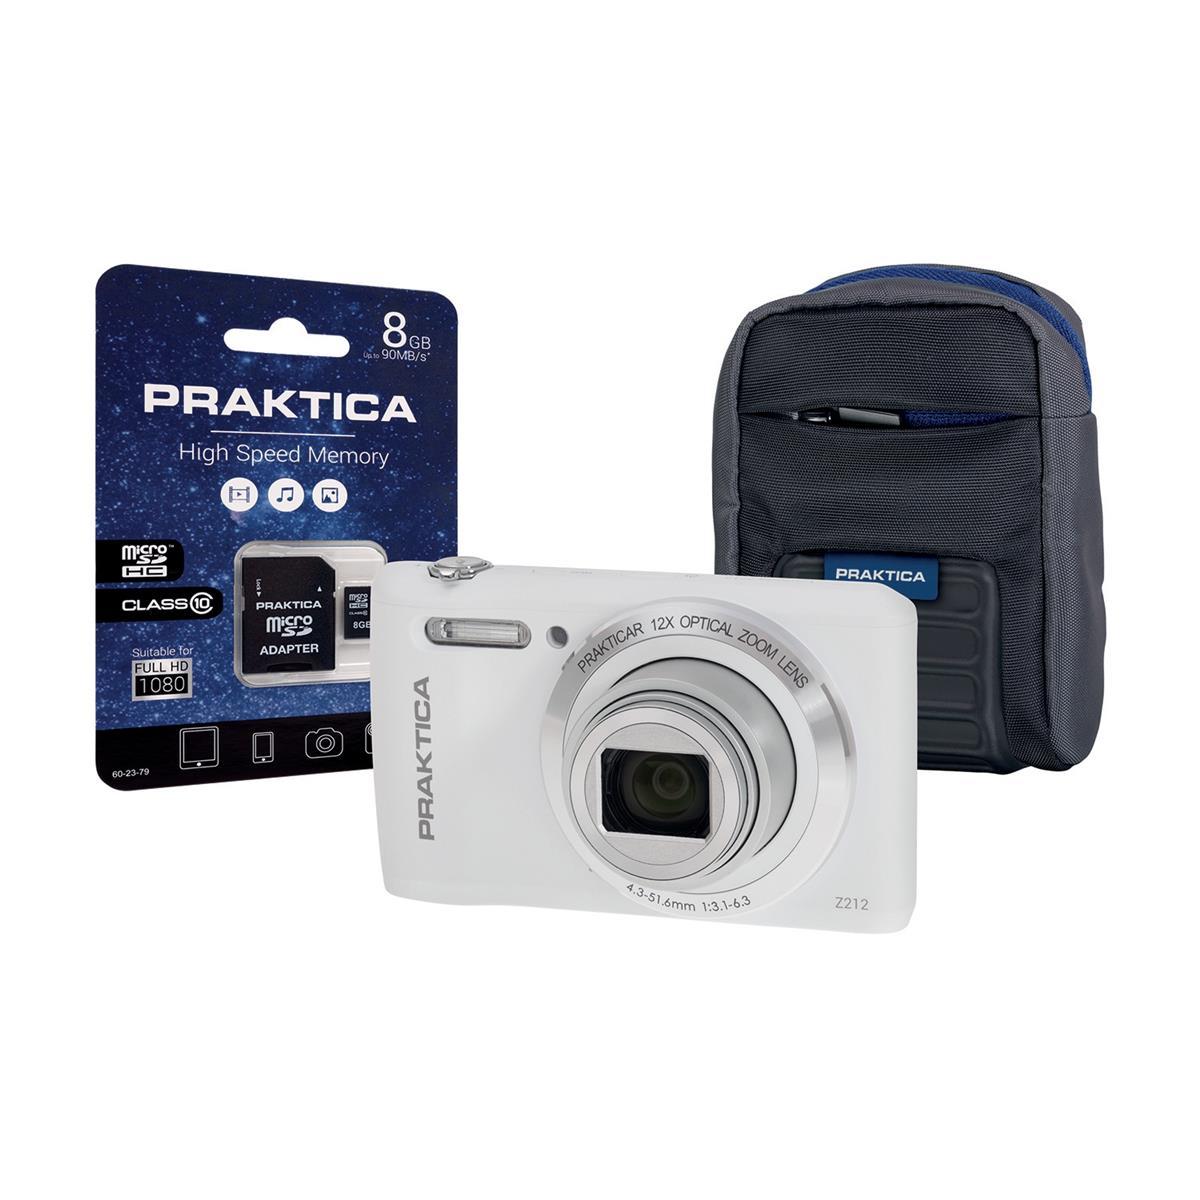 Praktica Z212 Digital Camera Kit Wide 12x Optical Zoom Lens 20MP White Ref Z212-W 8GBCASE